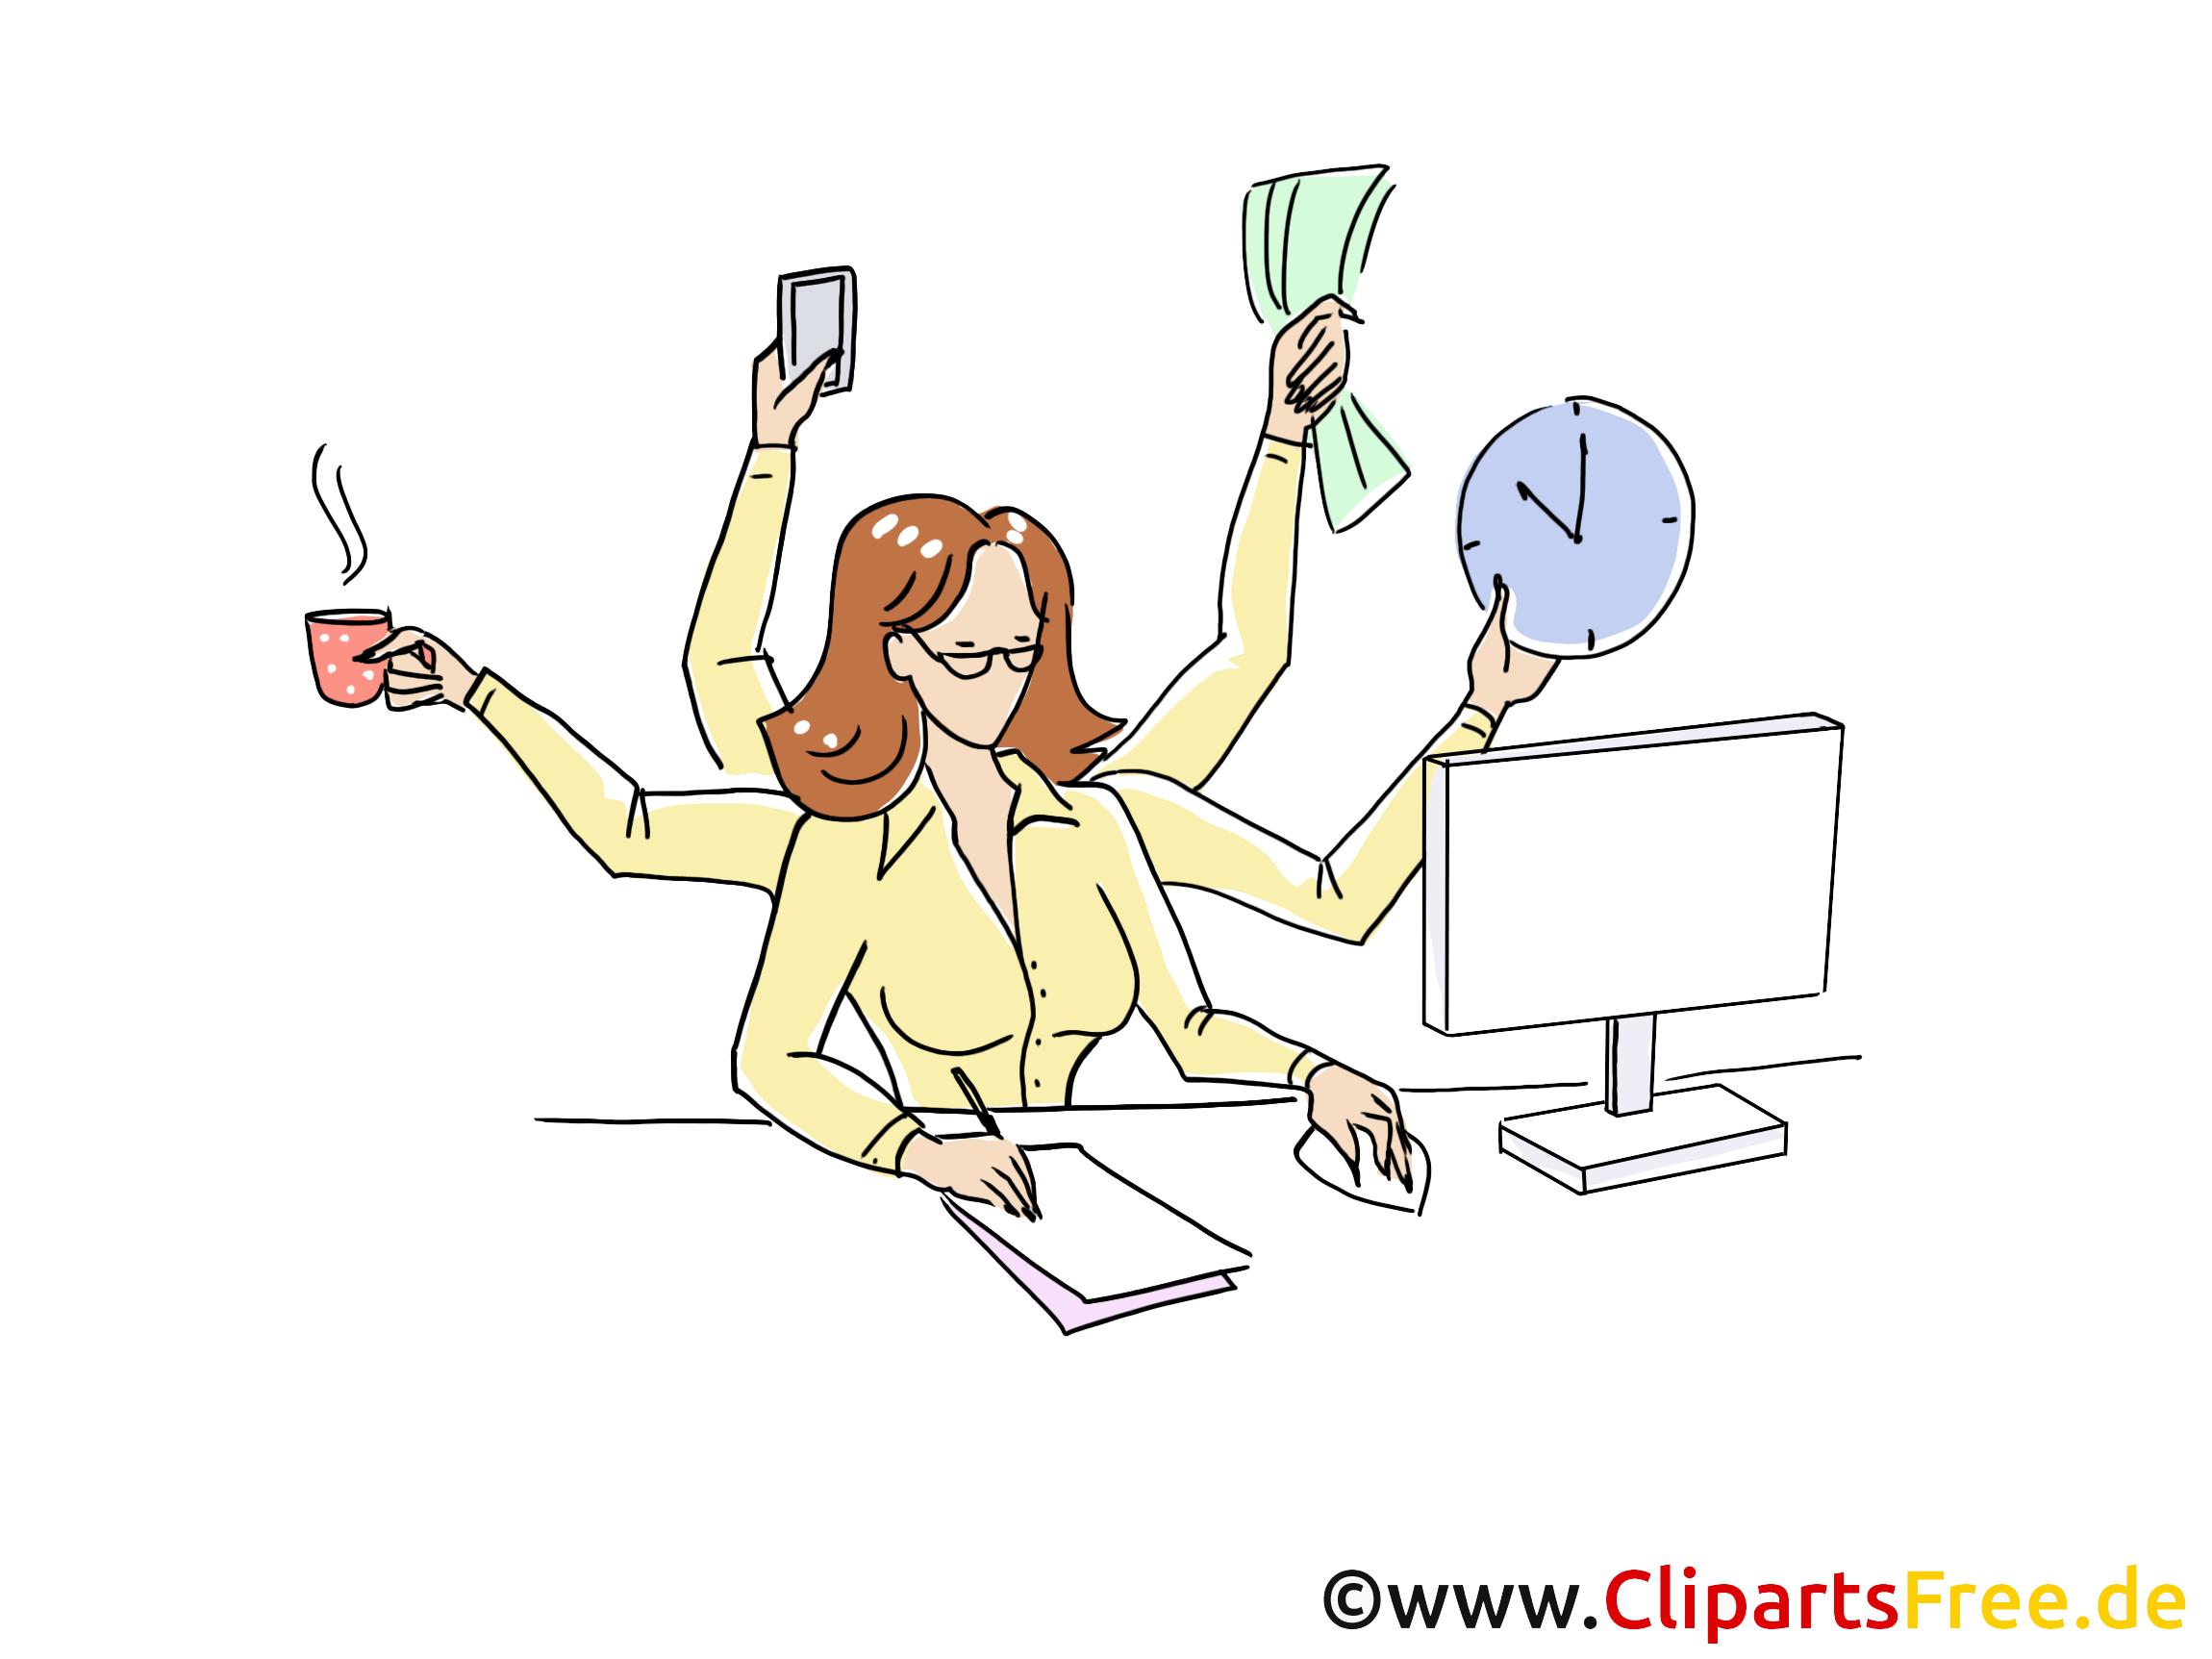 Frau im liegestuhl clipart  Büro Frau Clipart Kostenlos   saigonford.info